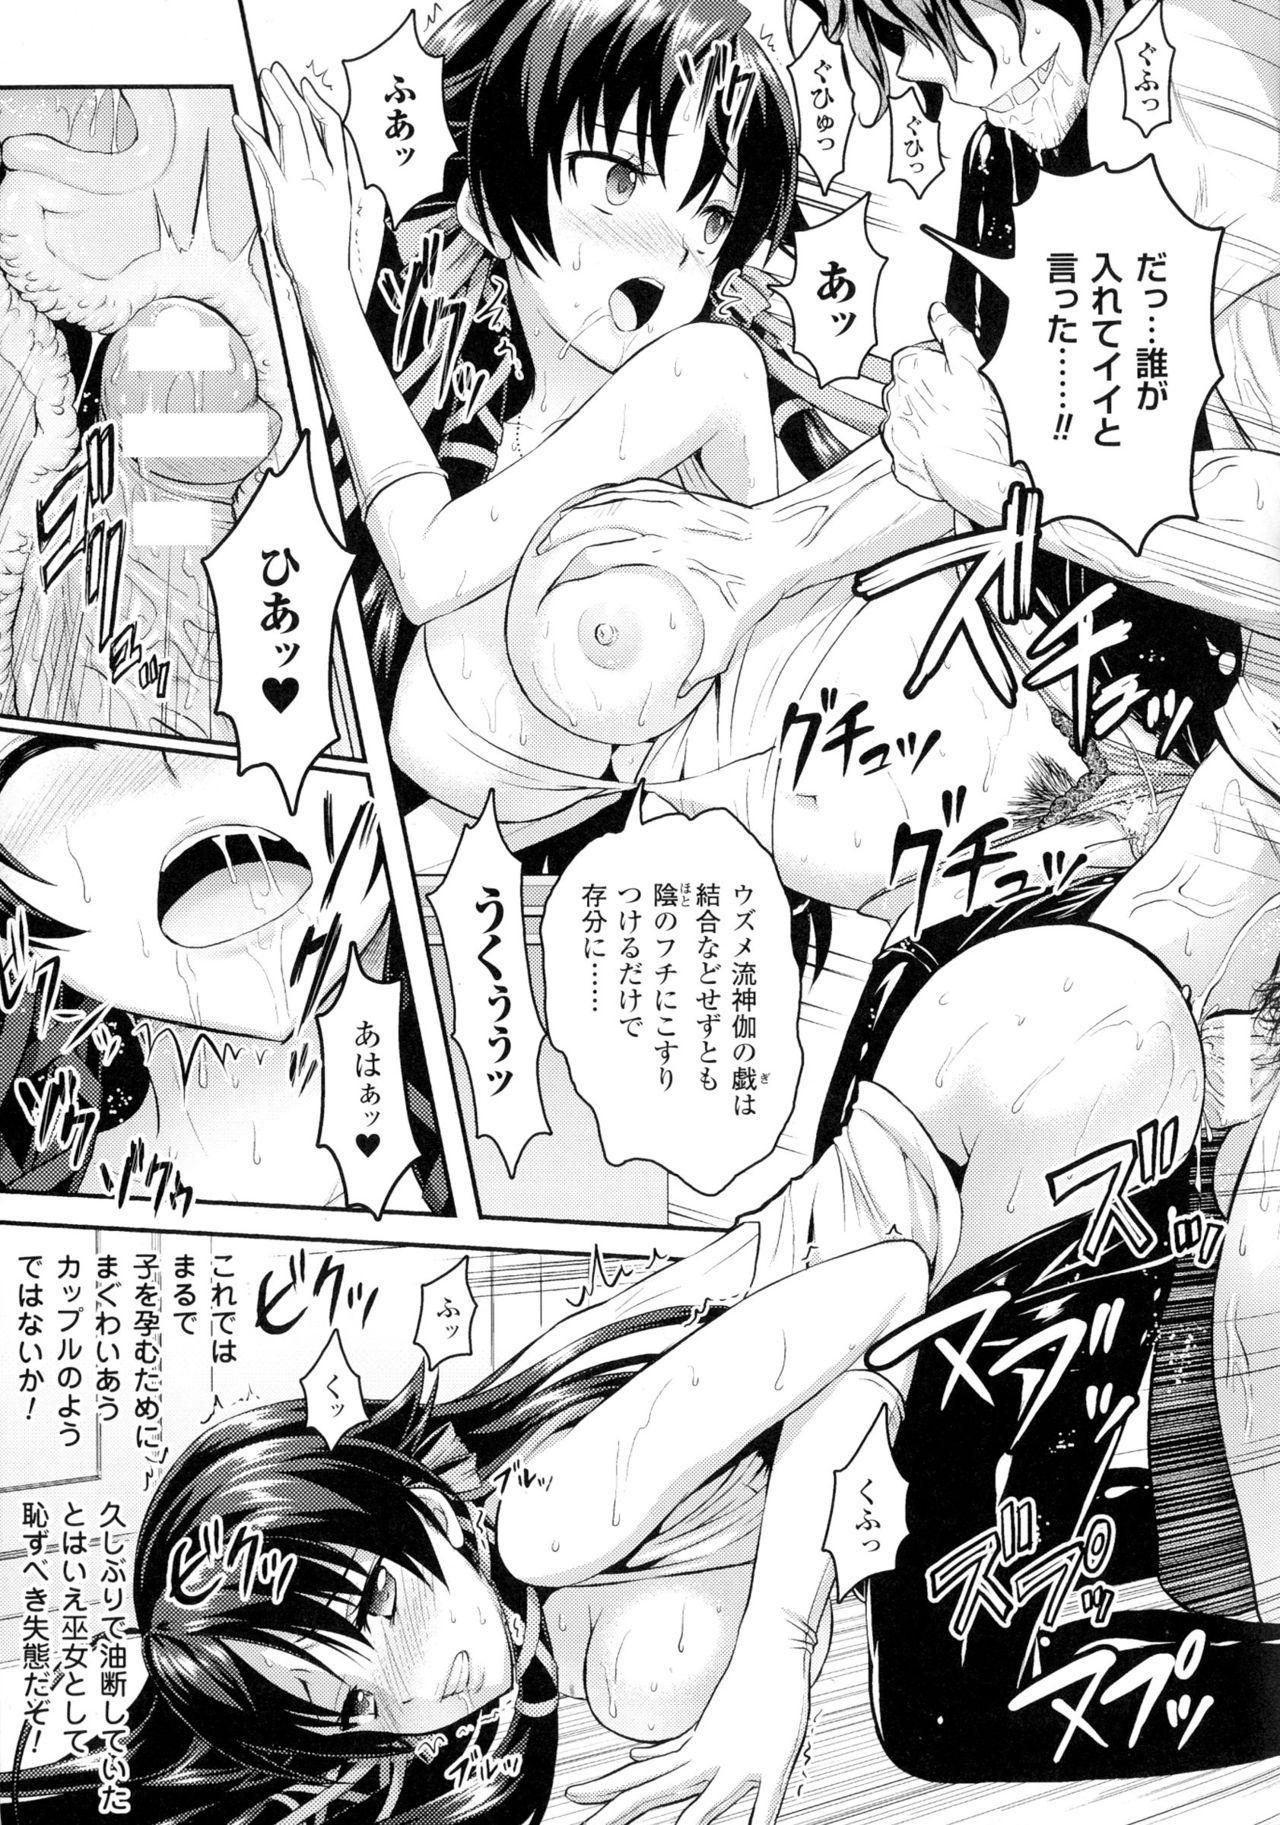 Seigi no Heroine Kangoku File DX Vol. 1 11